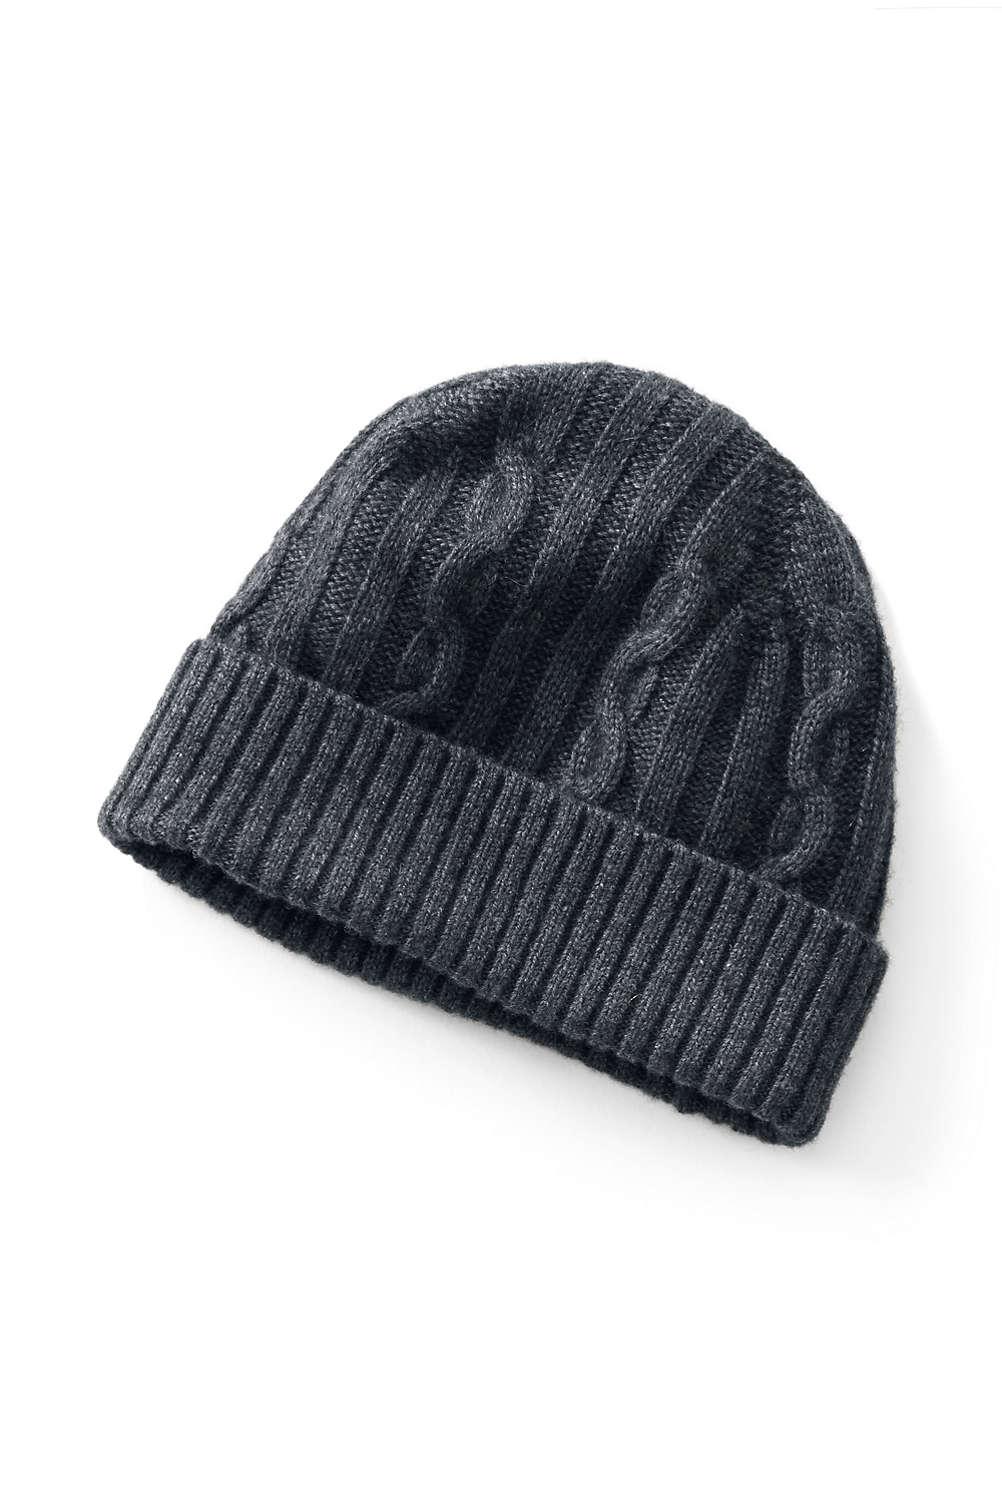 590a0c4e0584d Men s Knit Wool Cashmere Hat from Lands  End